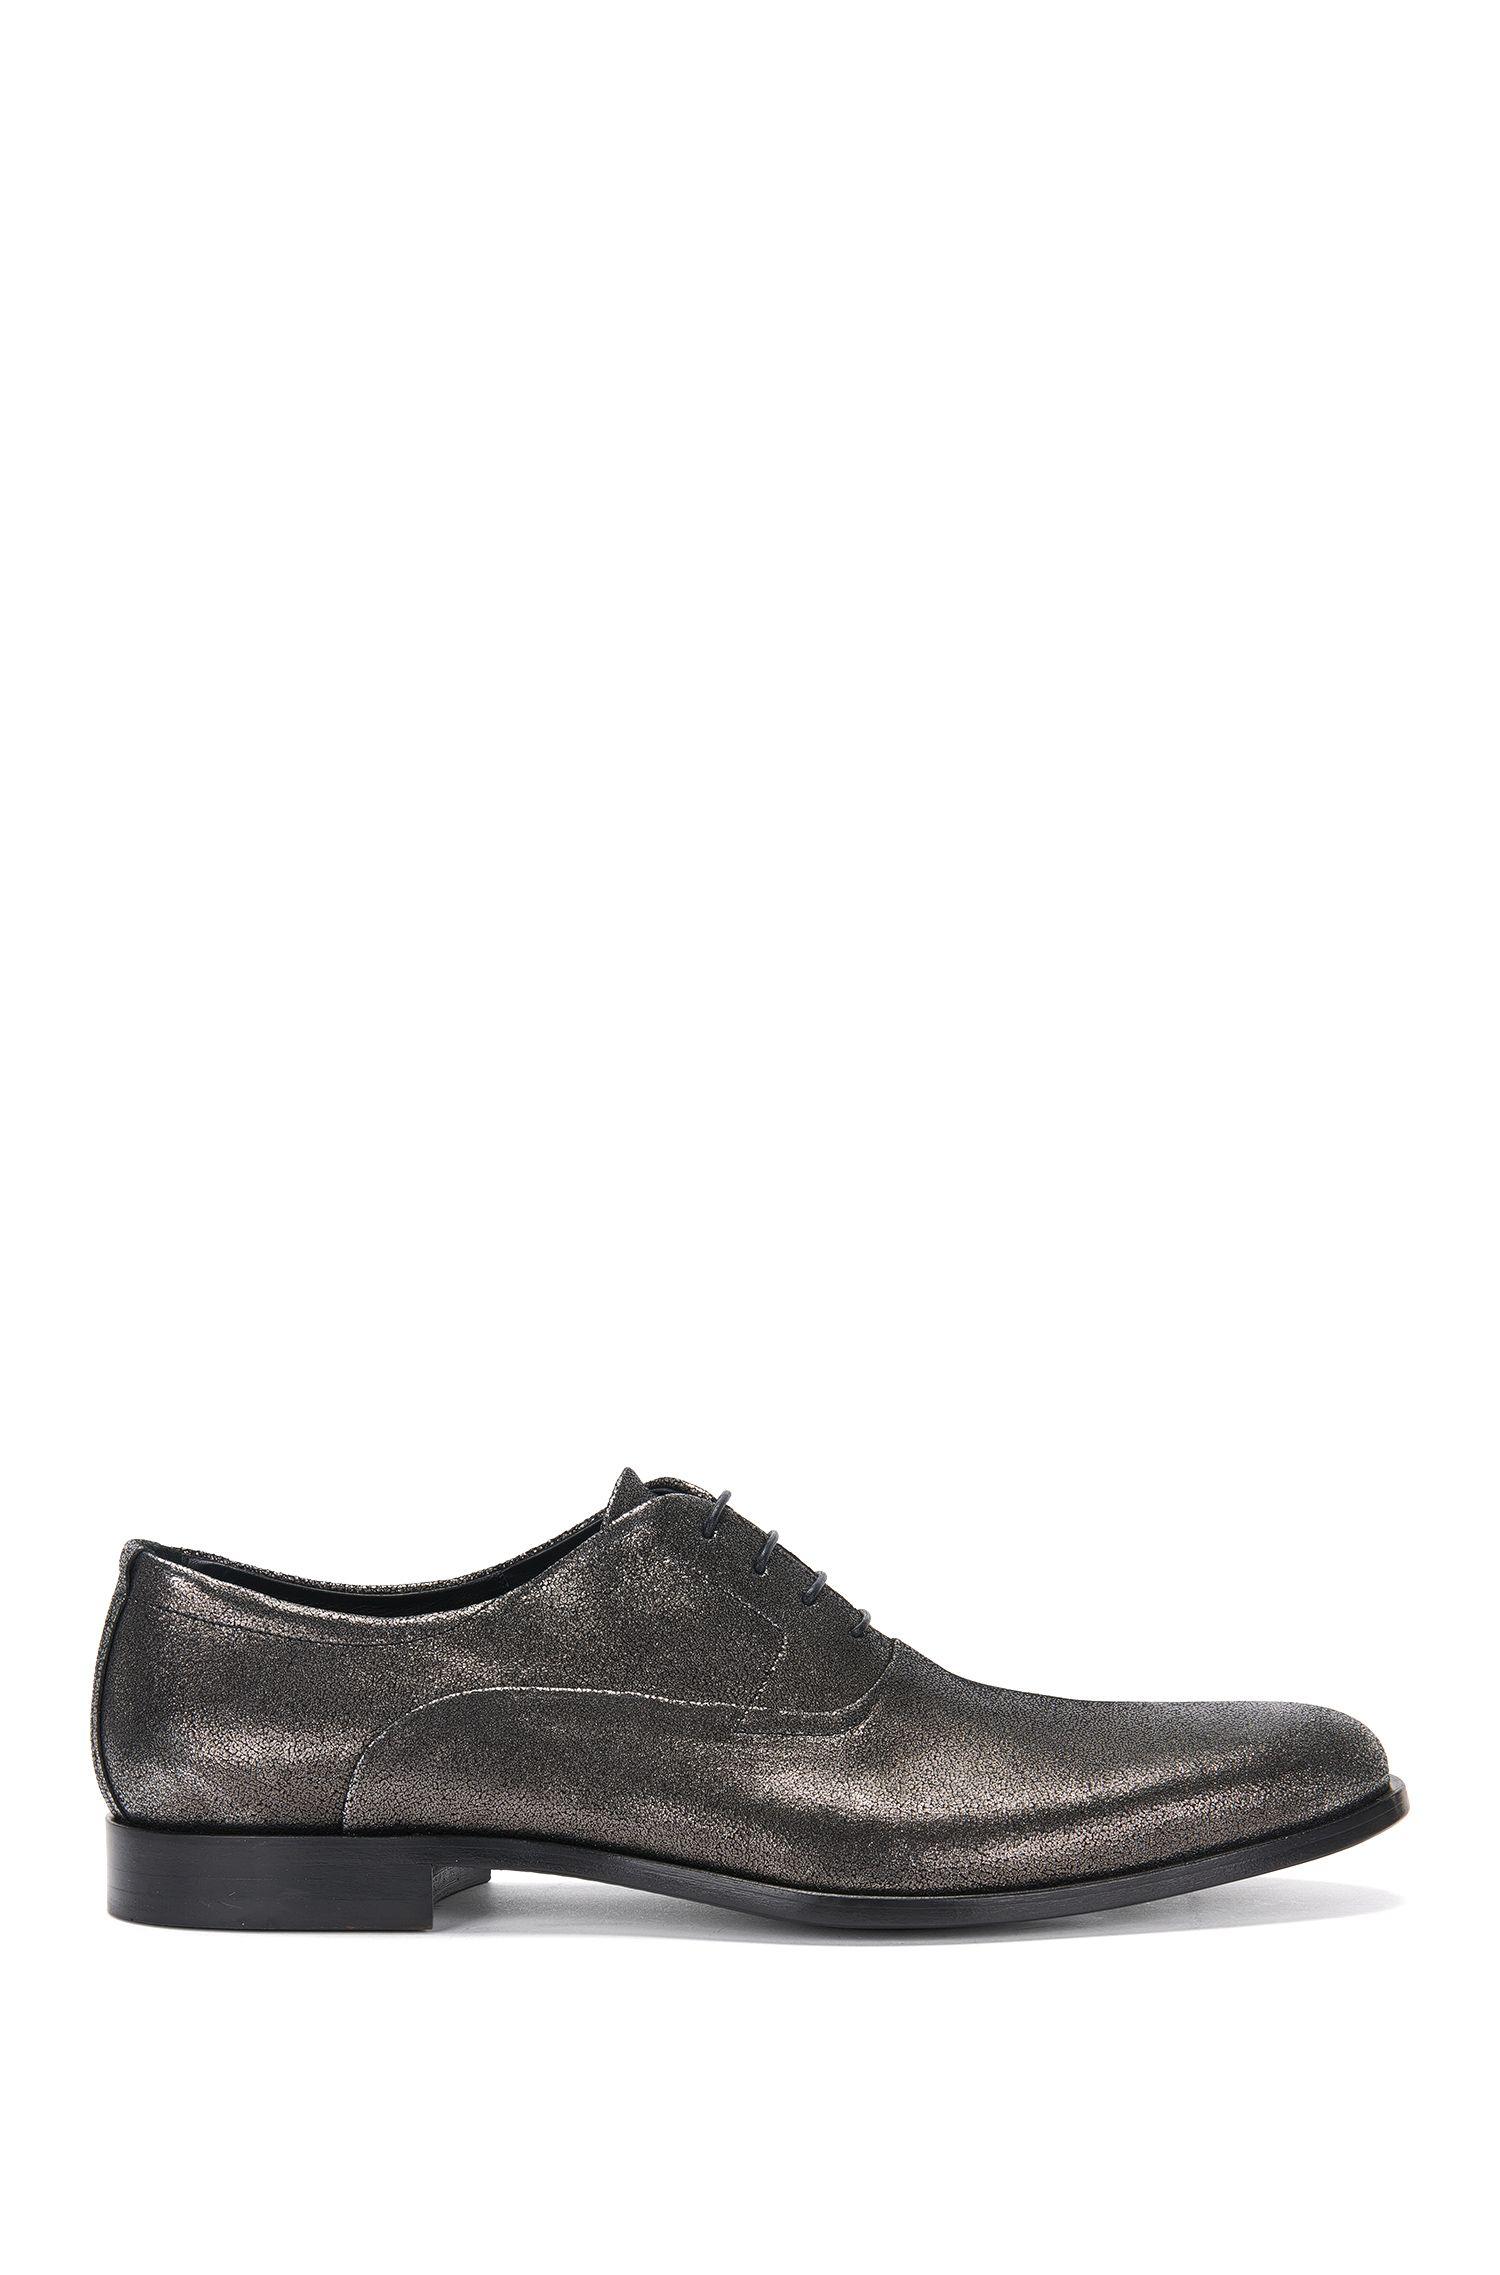 Italian Leather Suede Metallic Oxford Shoe   Sigma Oxfr Sdg